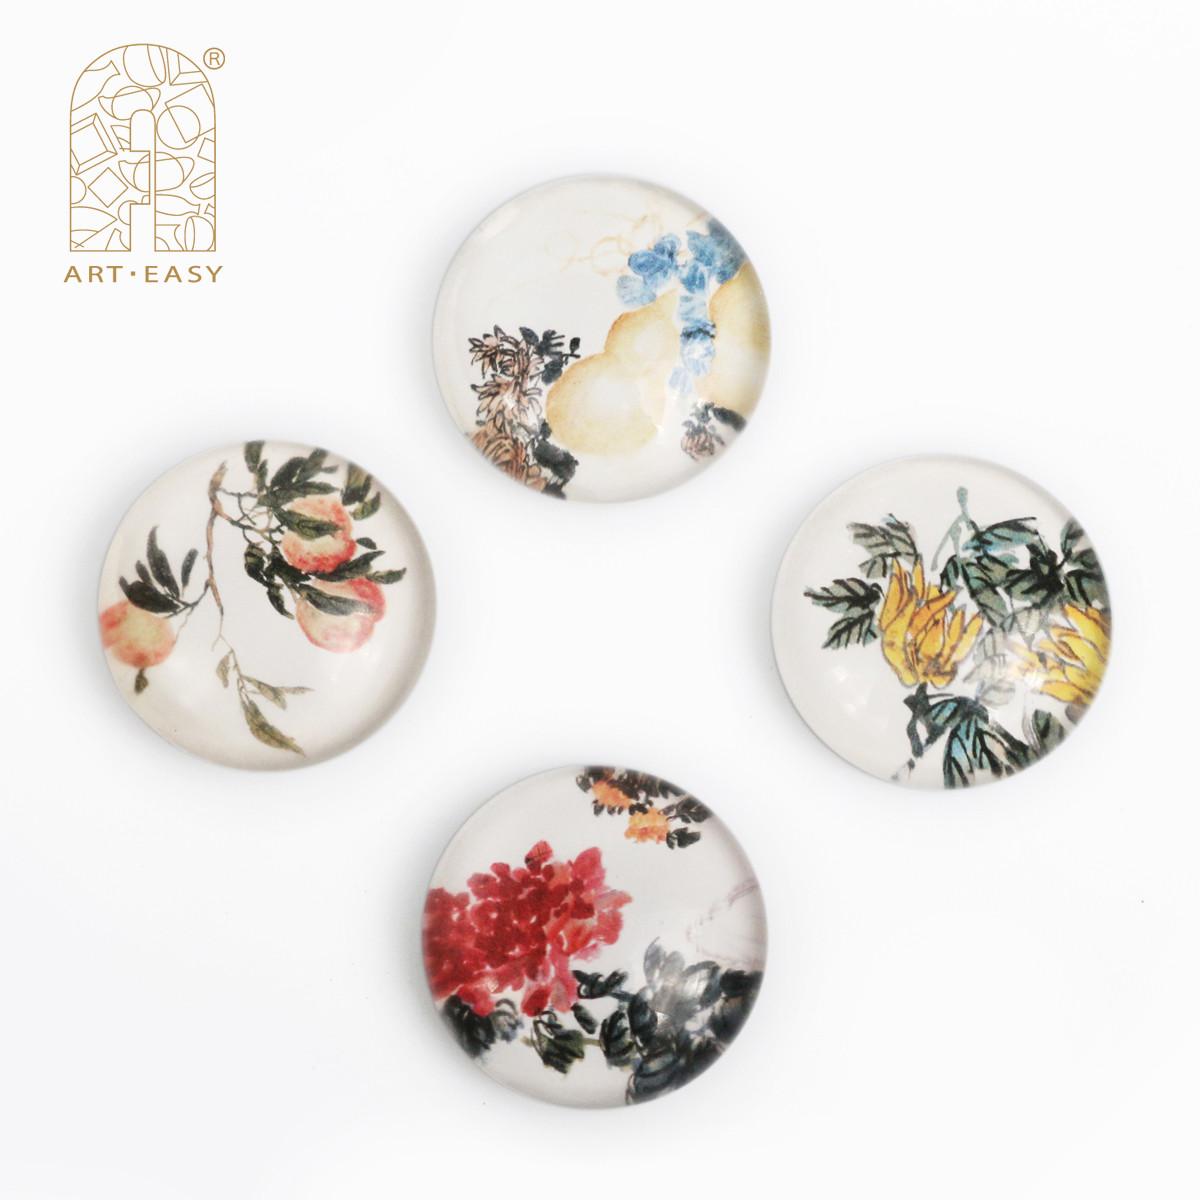 ARTEASY艺术浦东创意冰箱贴磁贴4只装水晶冰箱磁性贴磁铁吸铁石